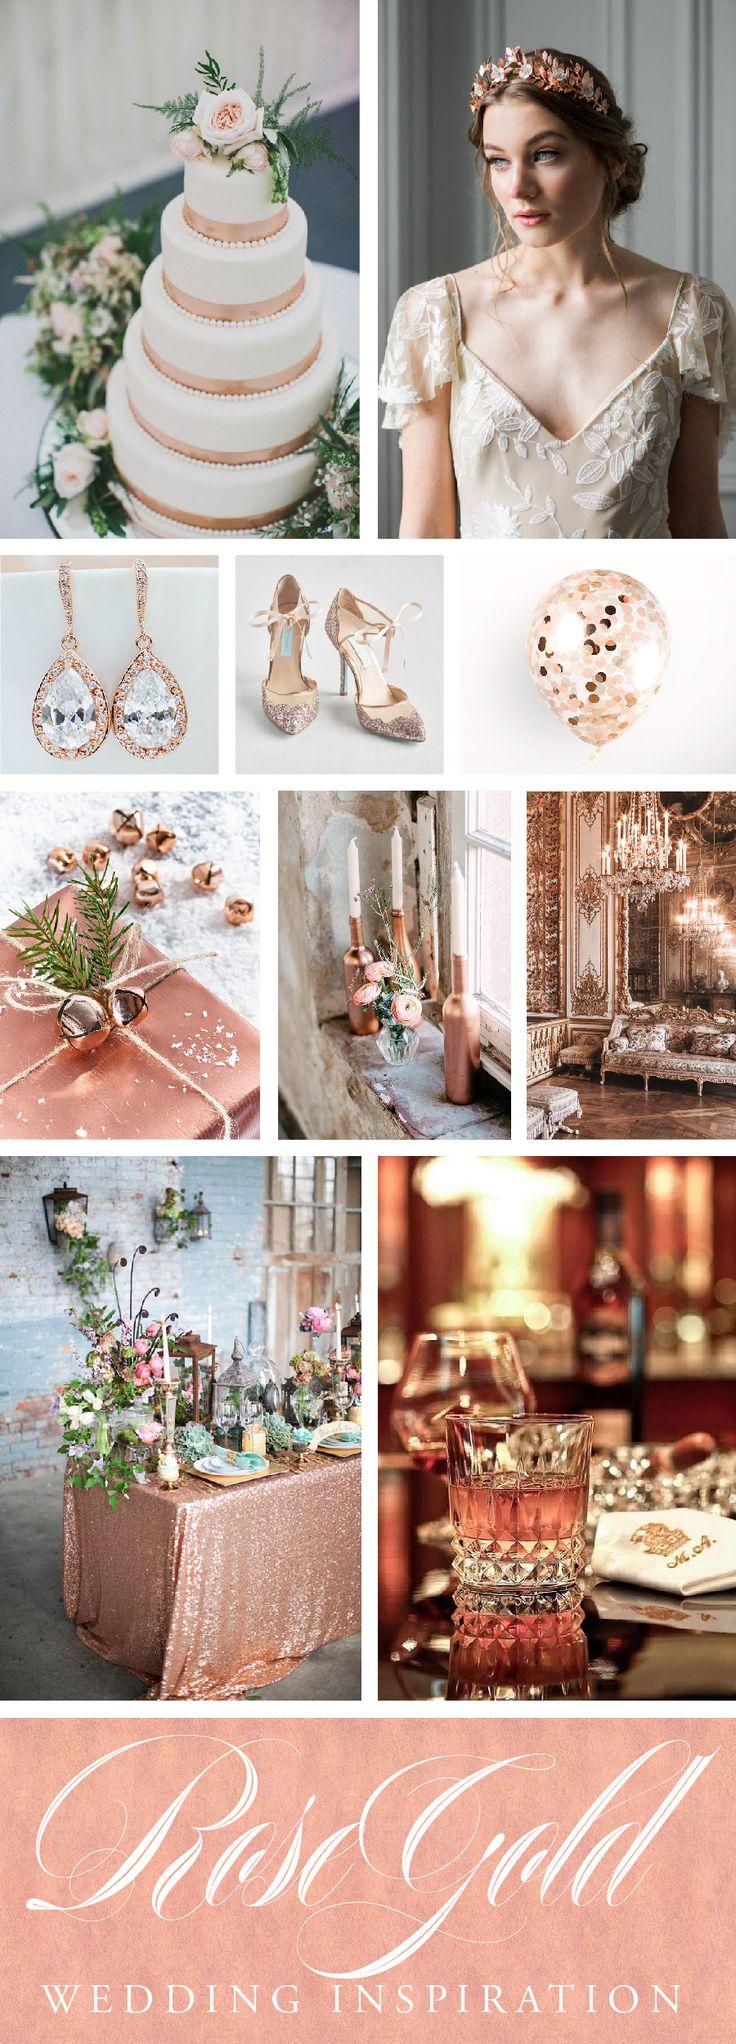 Rose Gold wedding color palette inspiration // www.chavelli.com